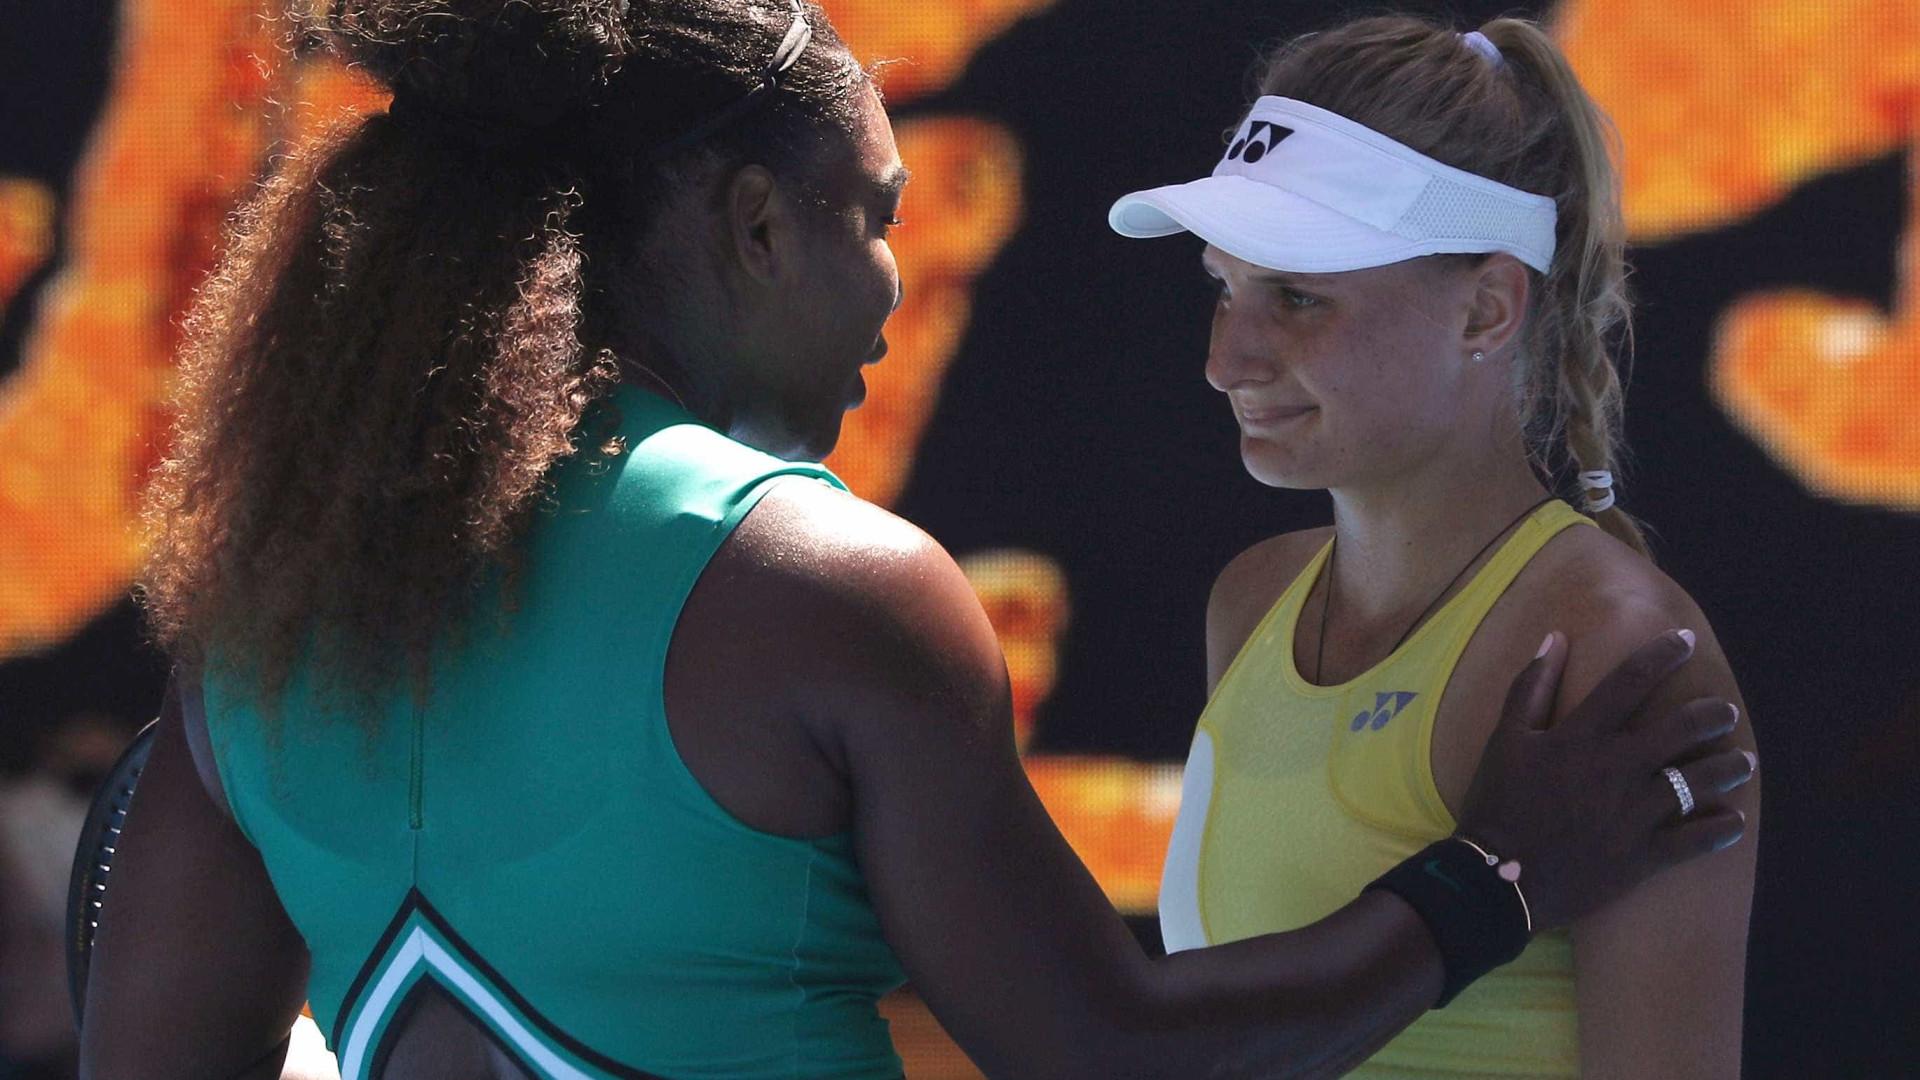 Serena Williams consola adversária após vitória no Aberto